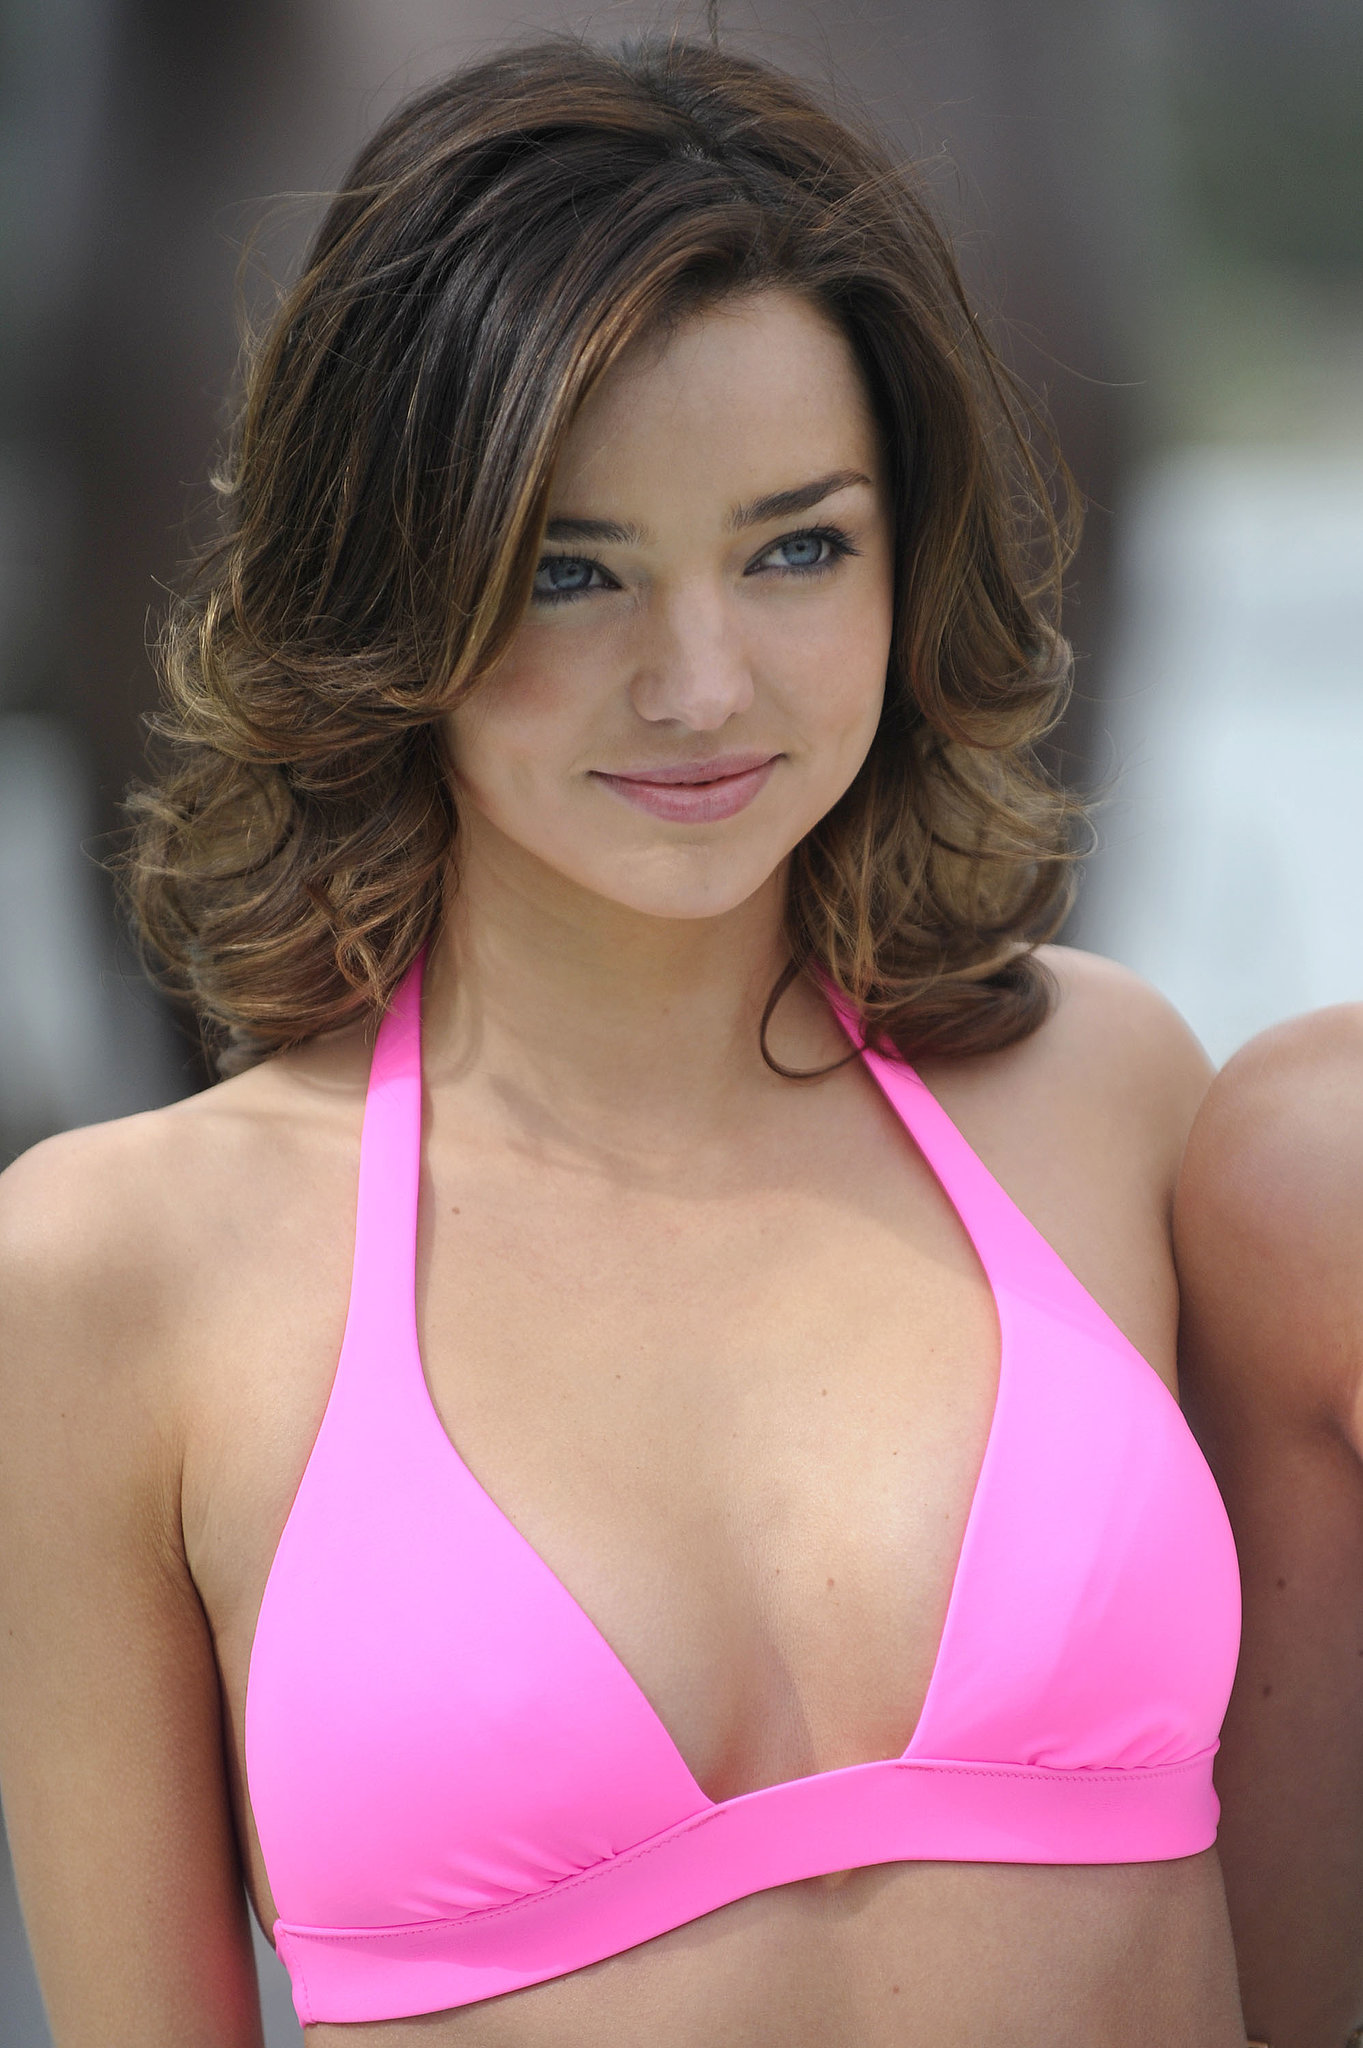 Miranda sported a shorter crop and a pink bikini at the celebration of the 15th anniversary of the Victoria's Secret Swim catalog in 2010.